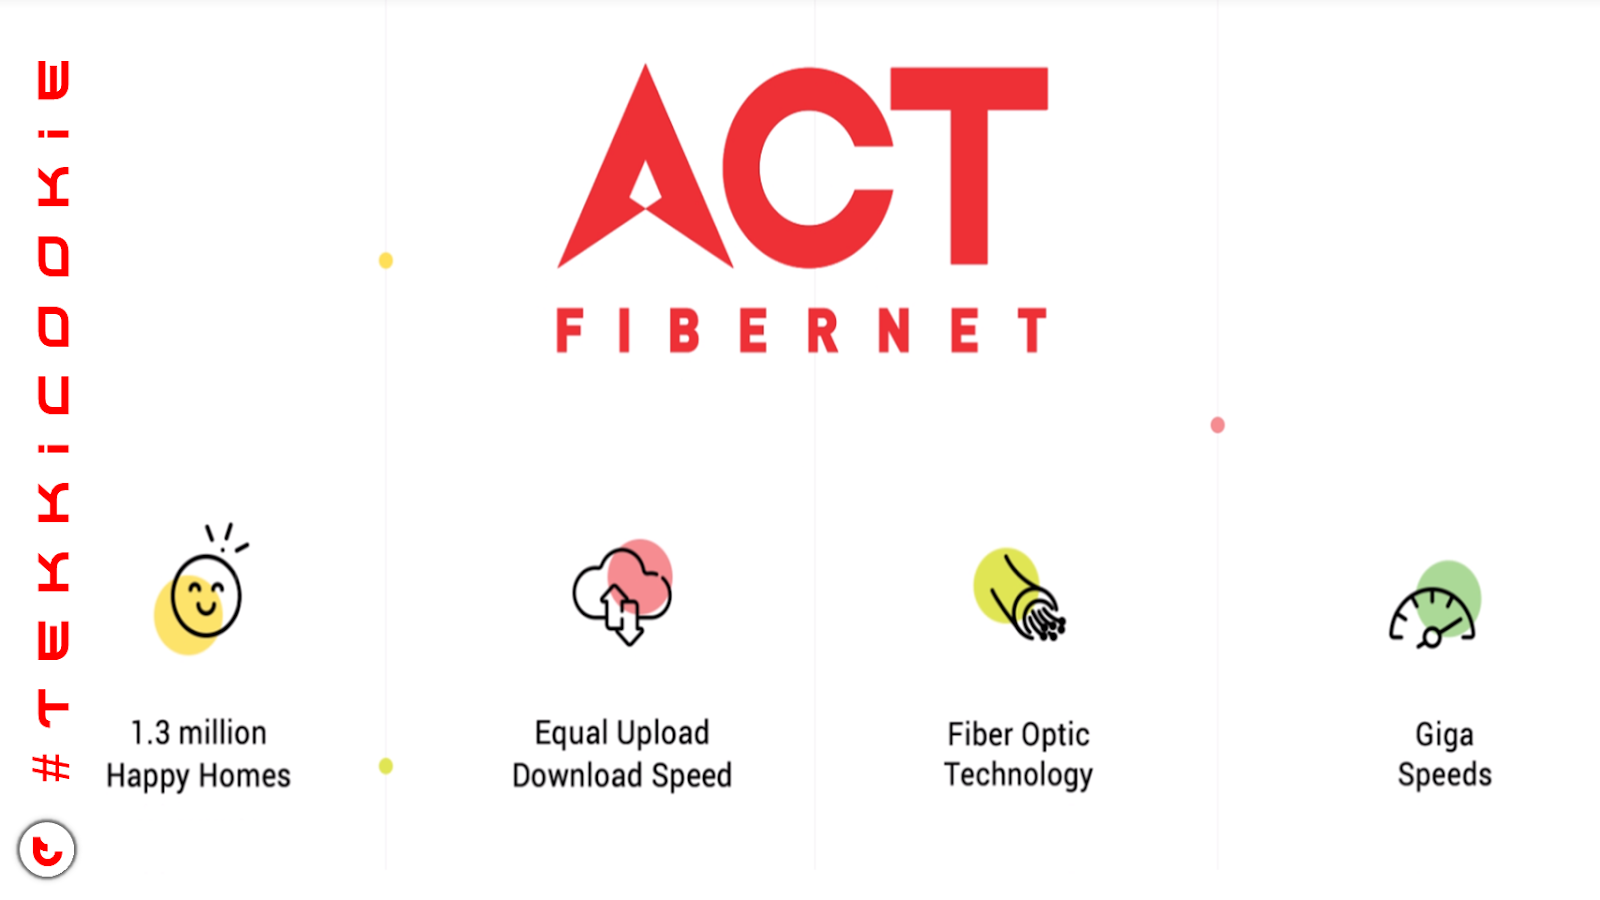 ACT_Fibernet_broadband